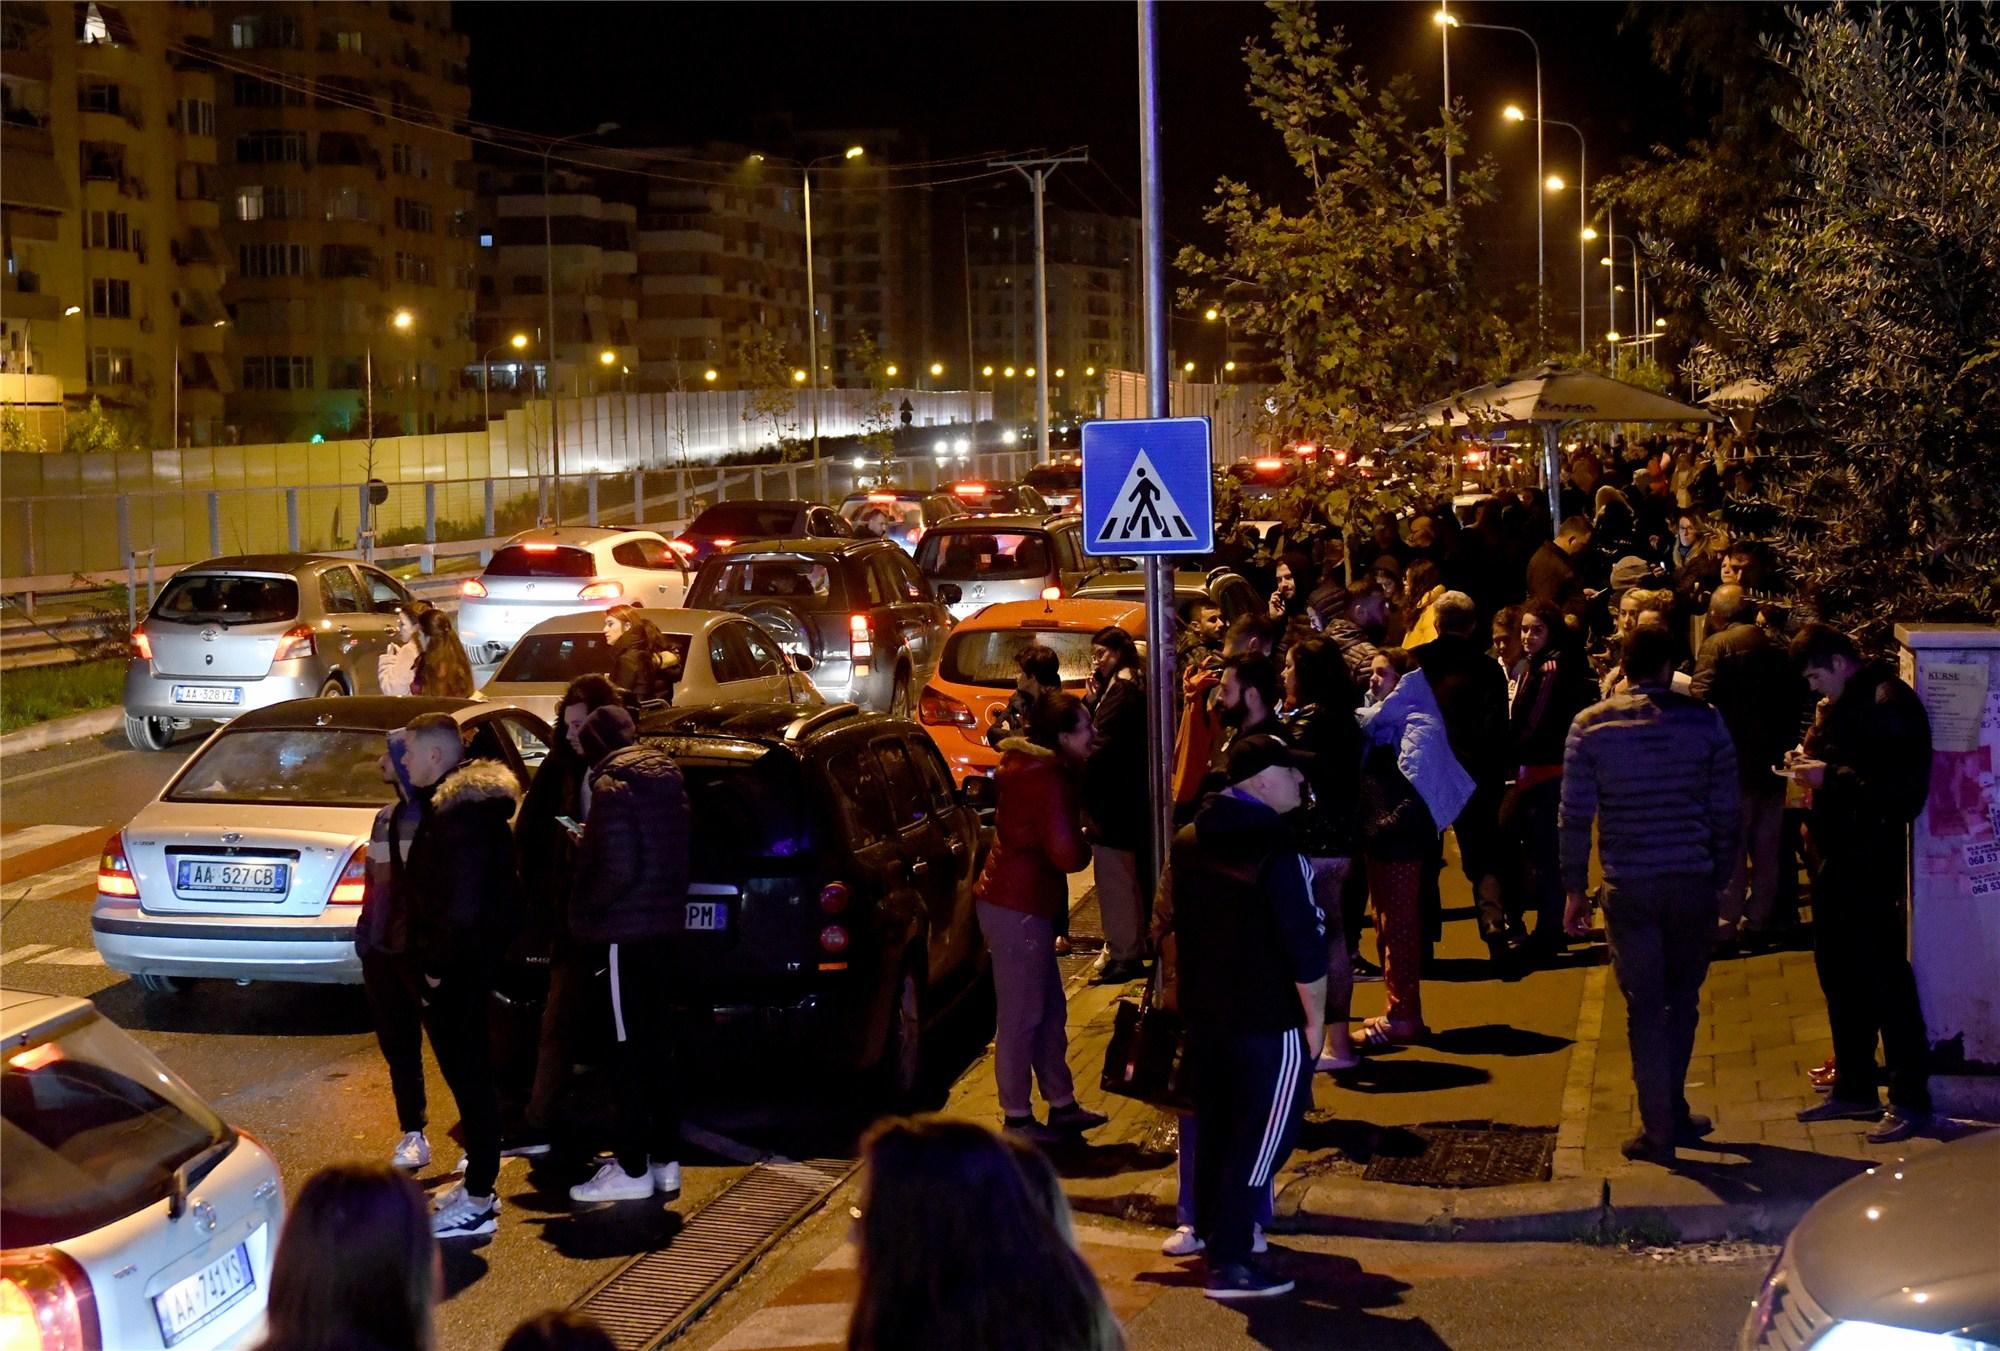 6.4-magnitude quake strikes Albania: authorities